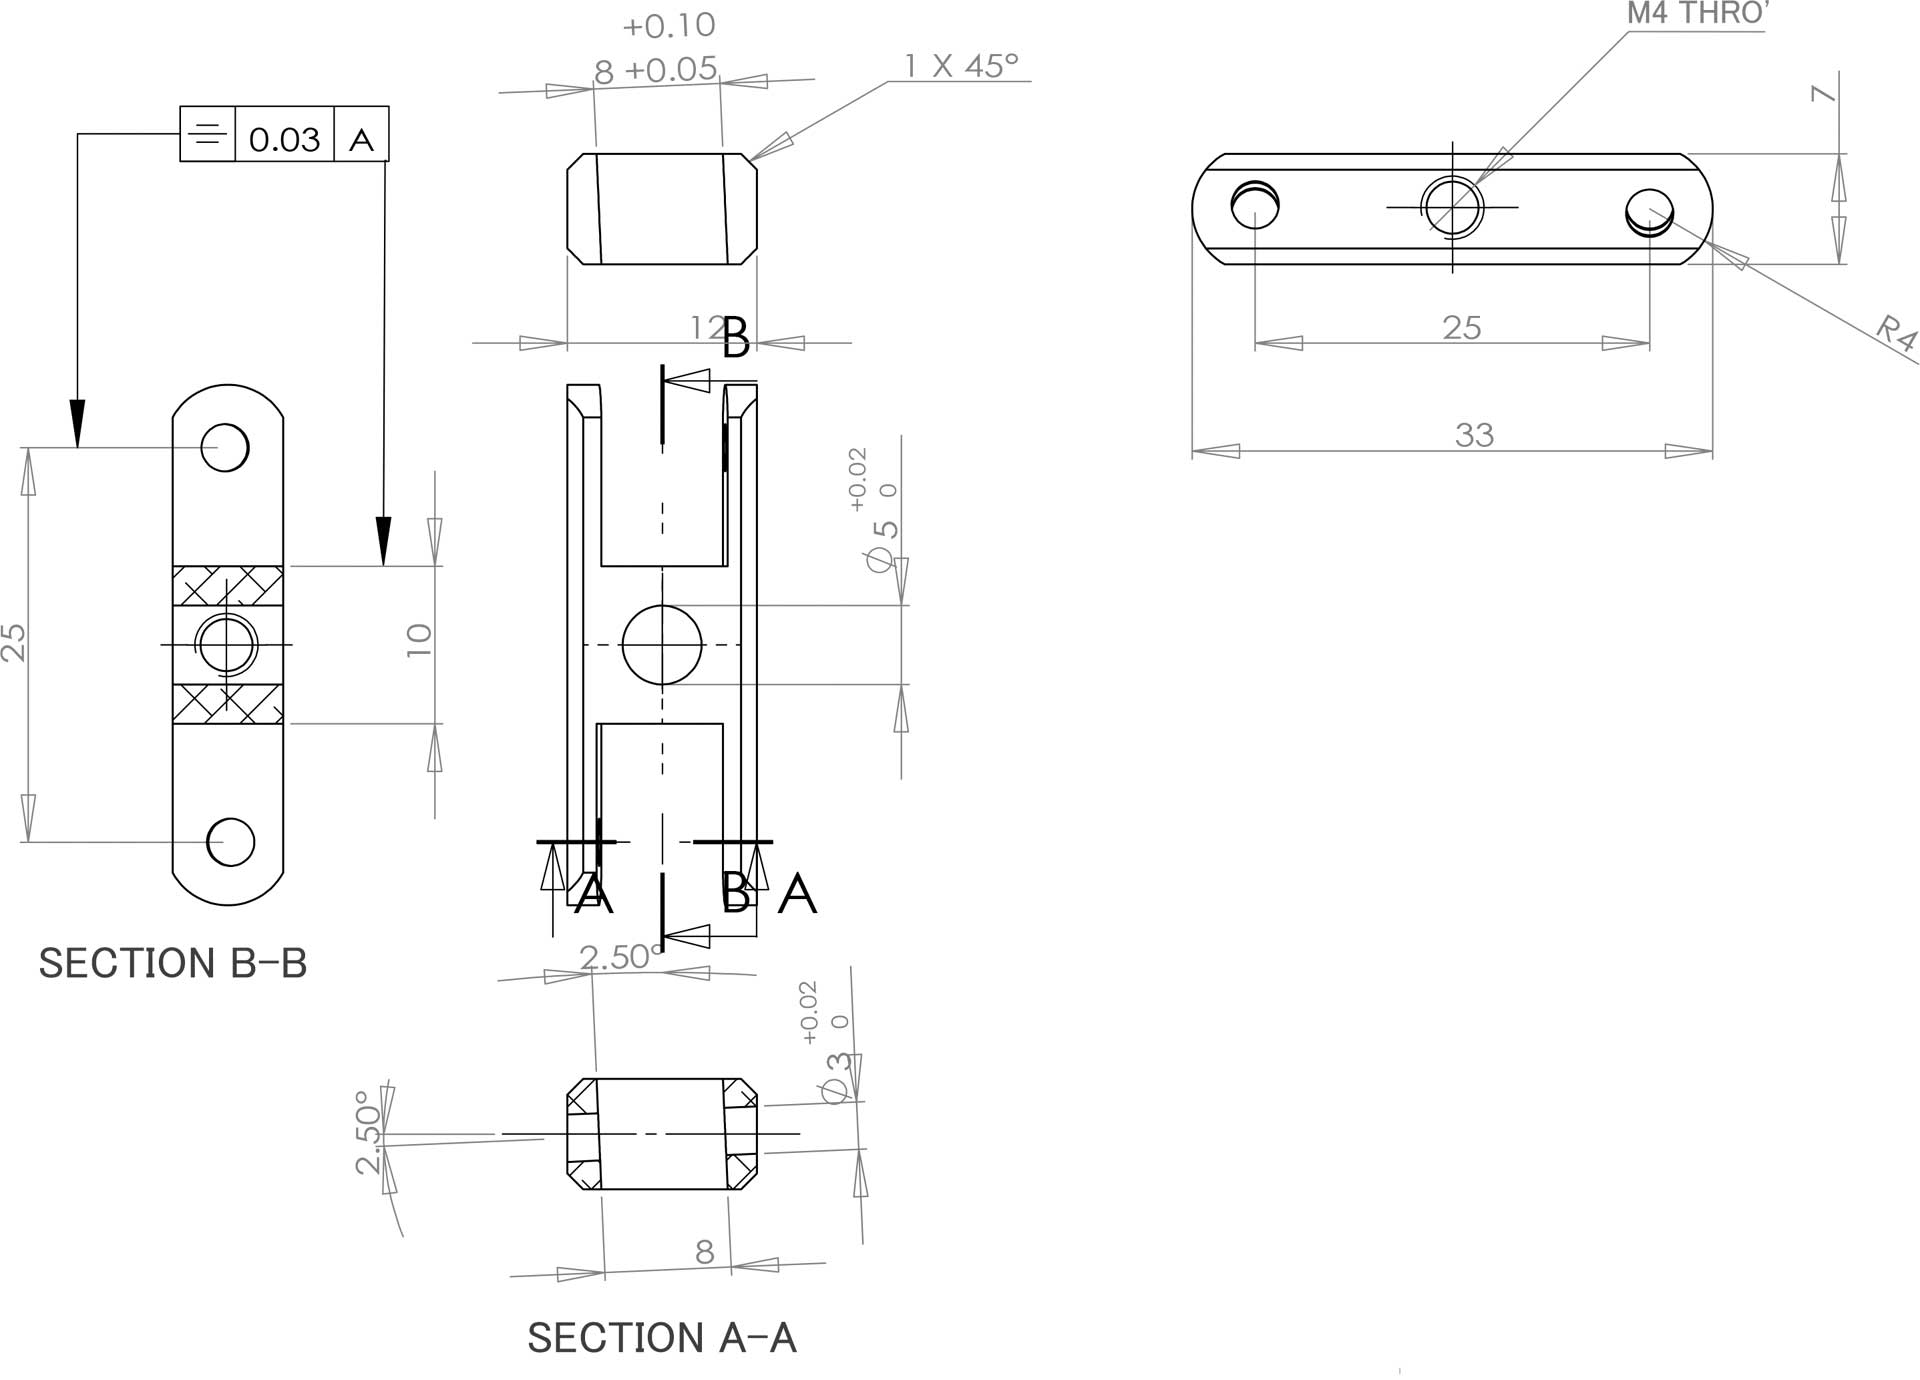 Robbe Modellsport avec telteil  LS 4226/12, 25mm, 2,5°, 5mm